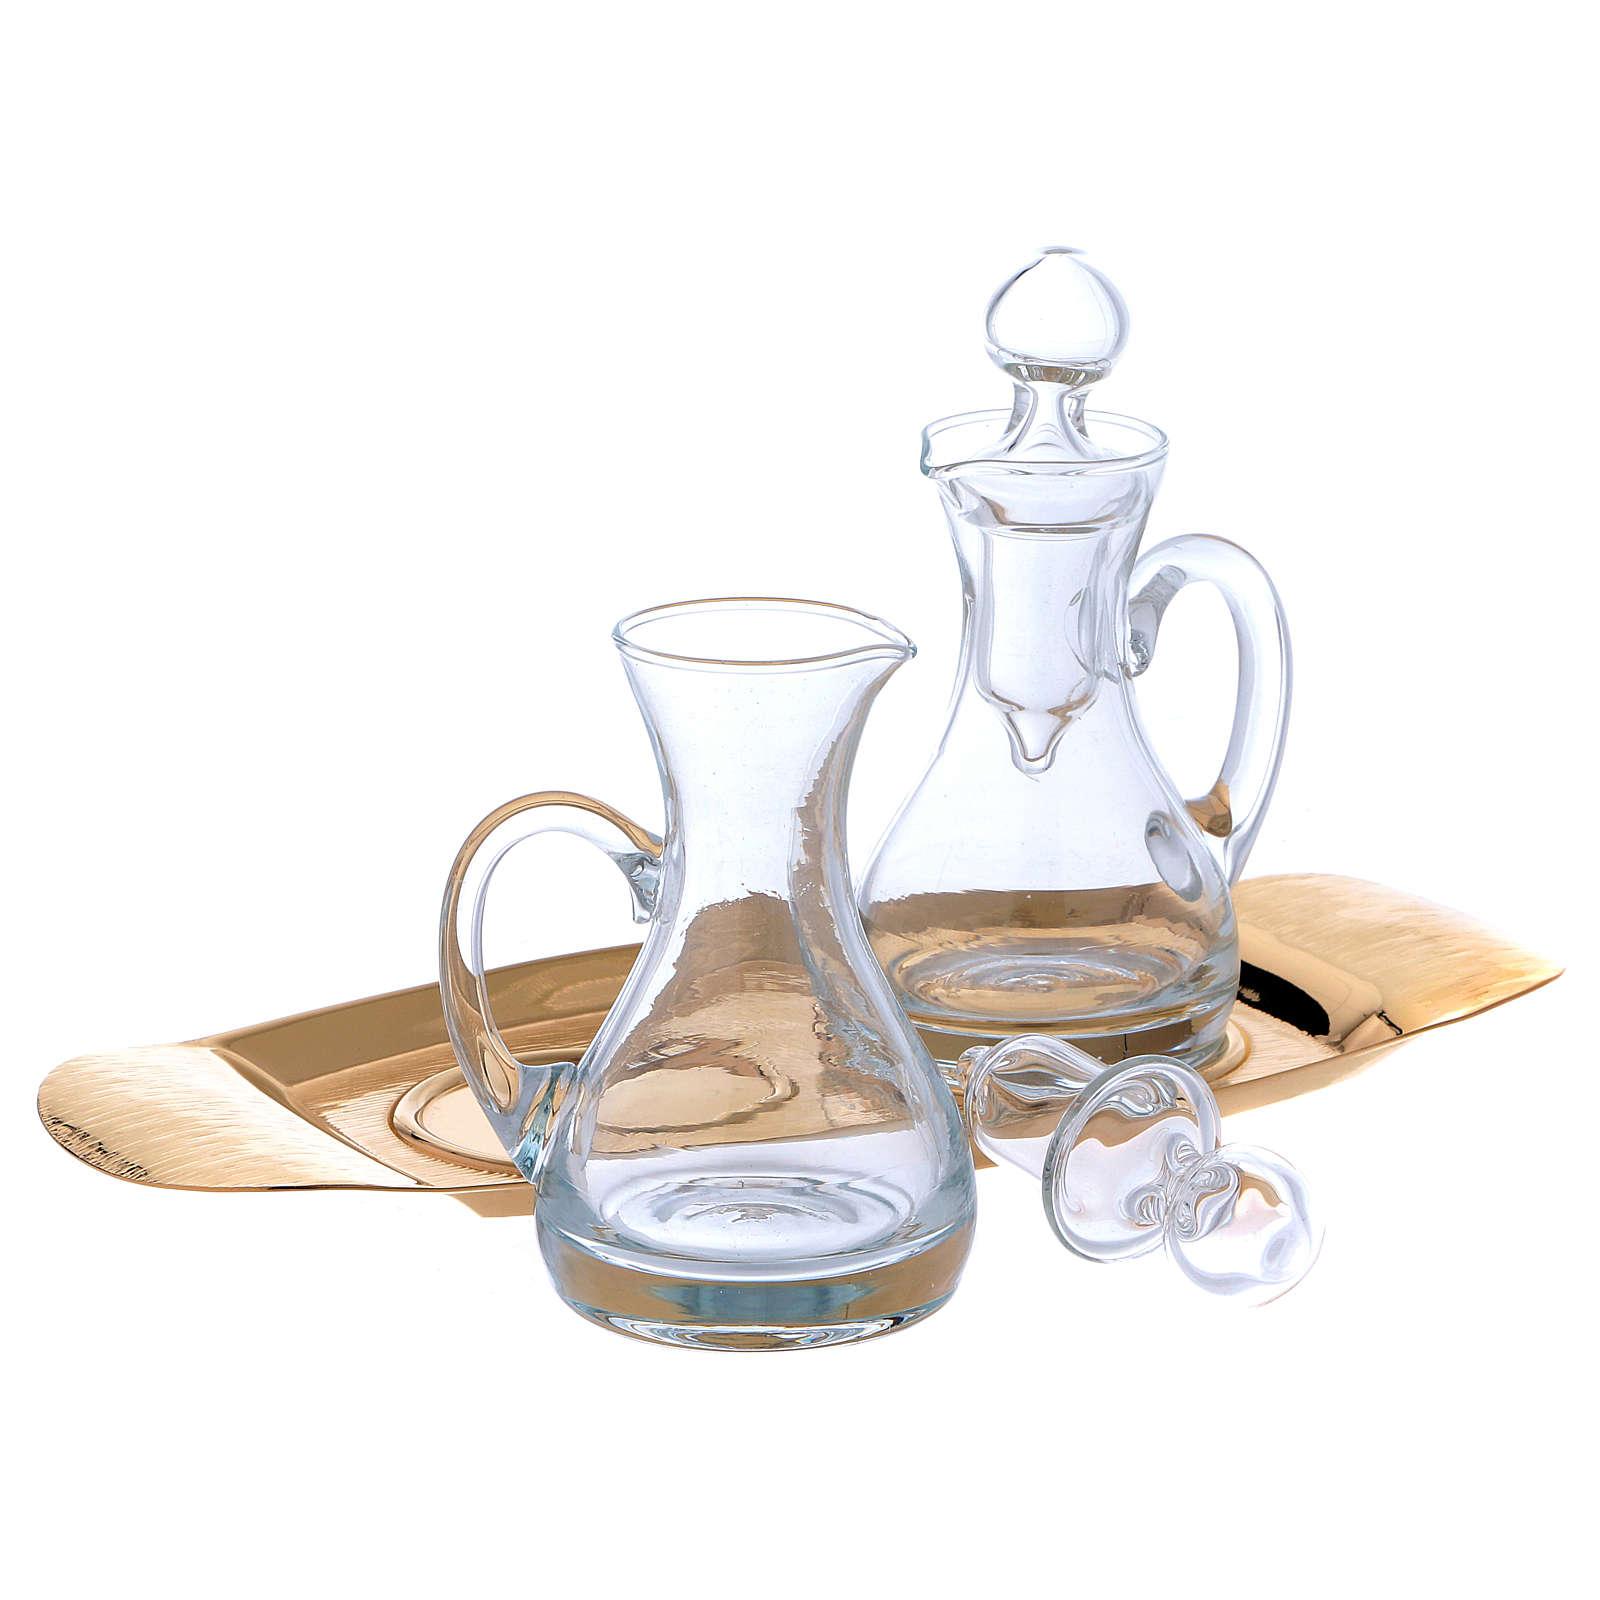 Molina cruets set in glass with brass tray 4